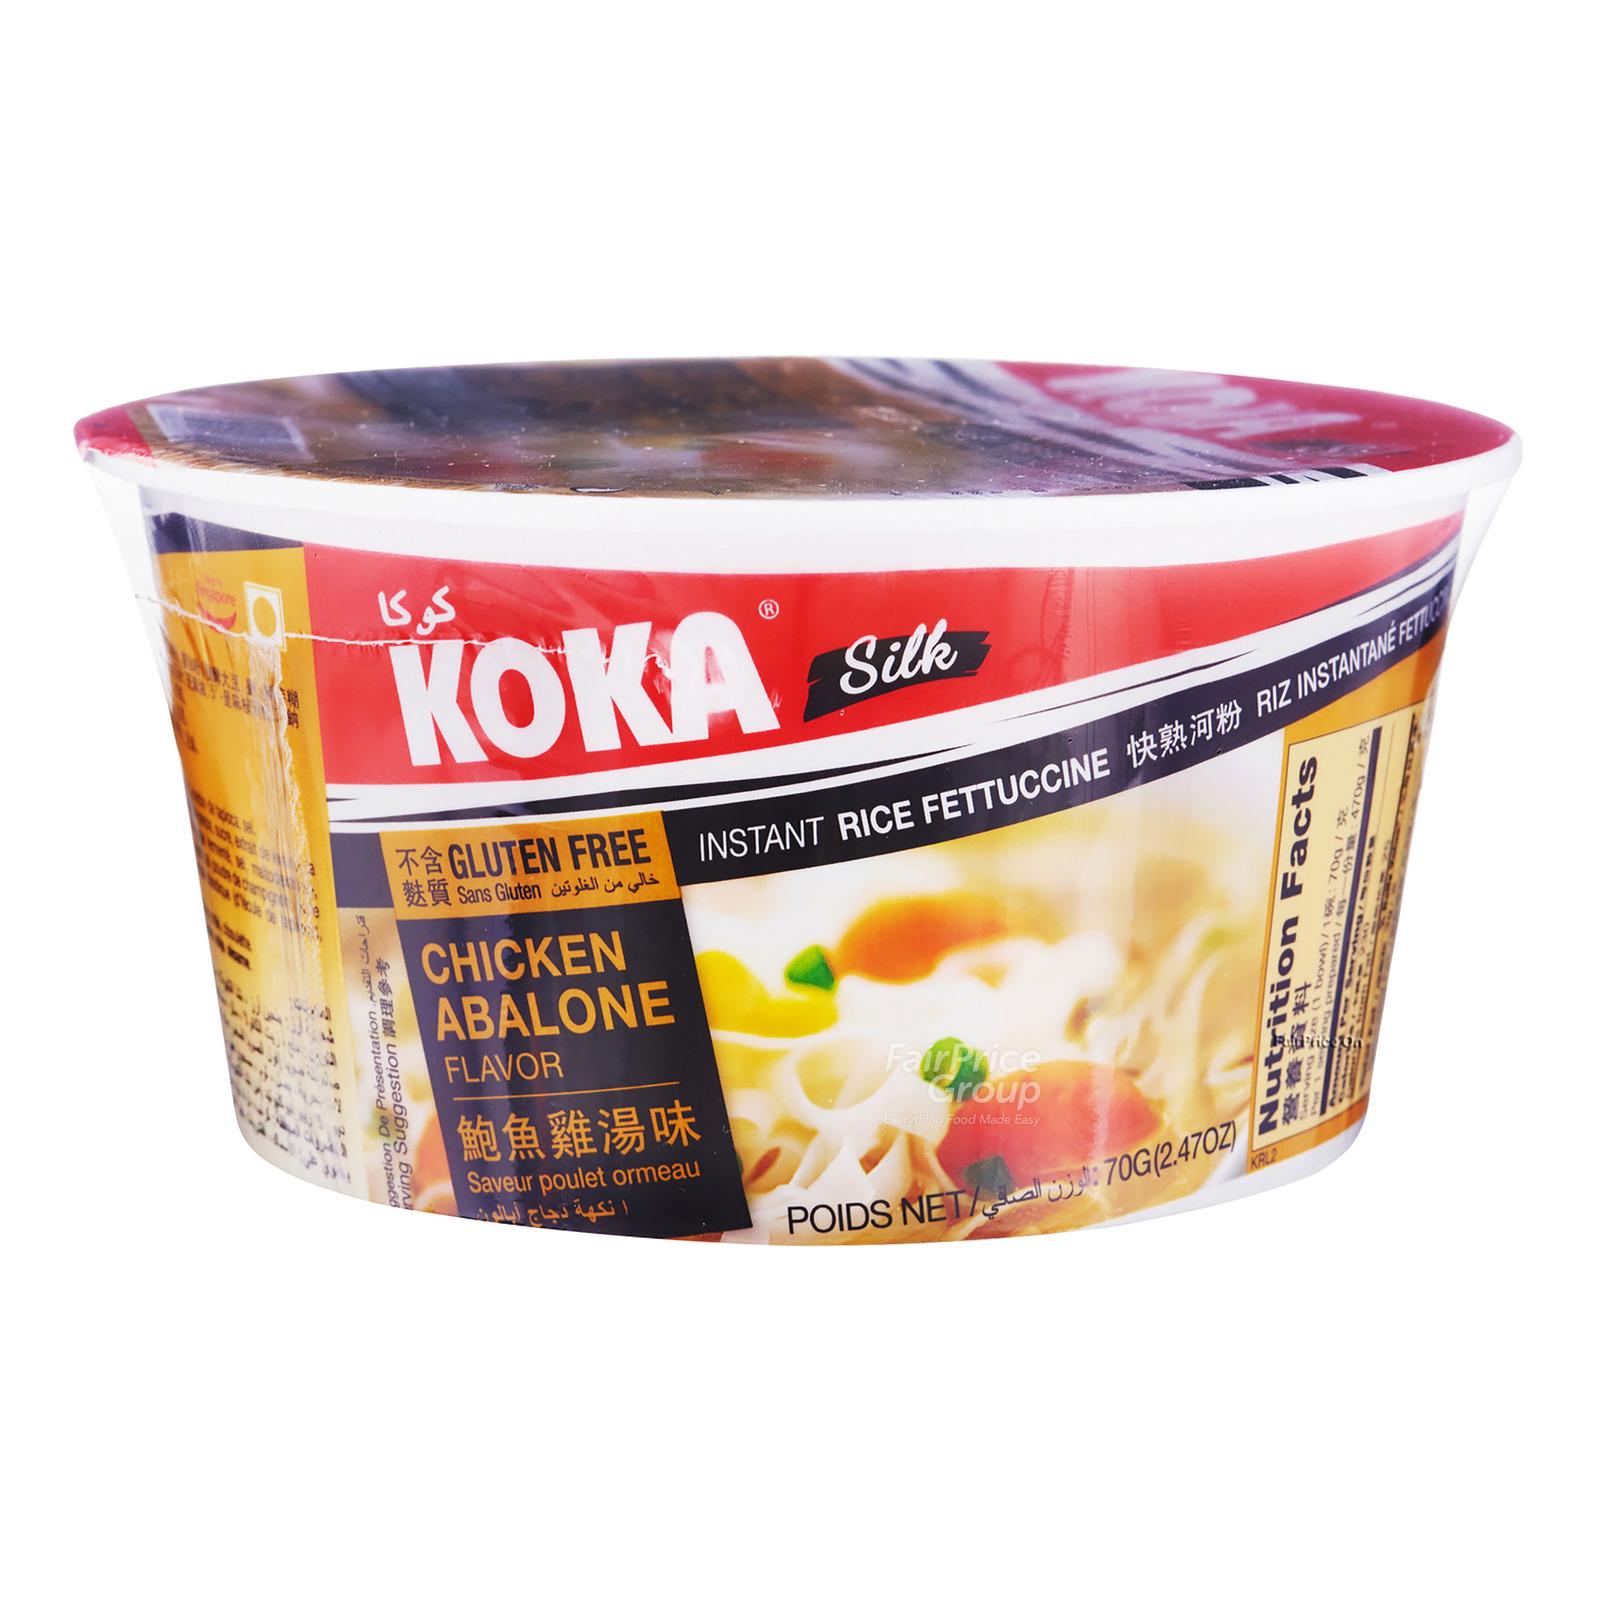 Koka Instant Silk Rice Fettuccine - Chicken Abalone